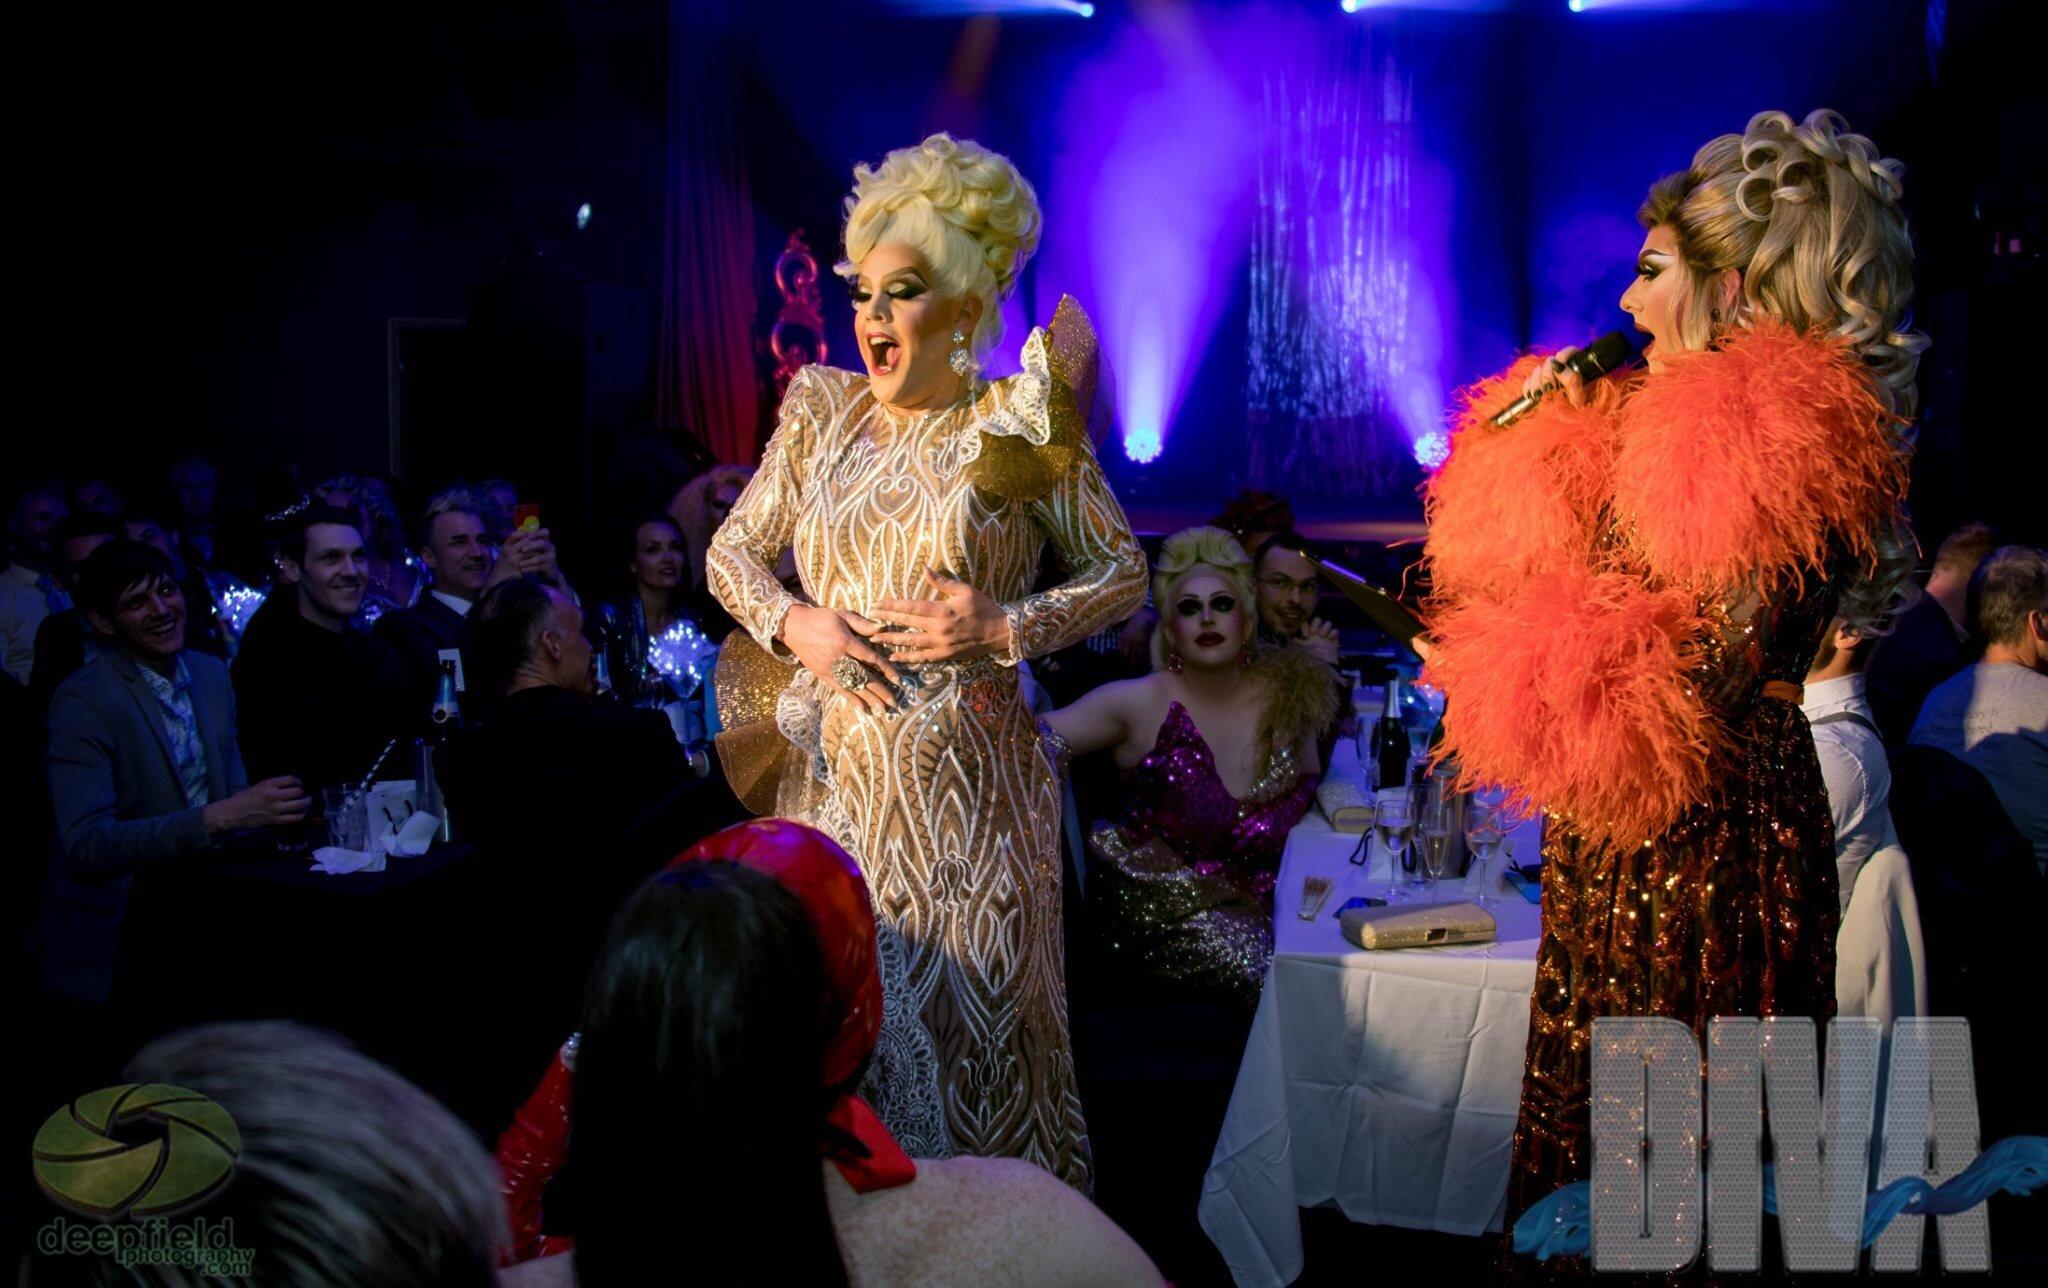 charisma-belle-corporate-host-event-hosting--carmen-geddit-laugh-diva-awards-sydney-drag-queen-royalty-best-hire-drag-race-australia.jpg